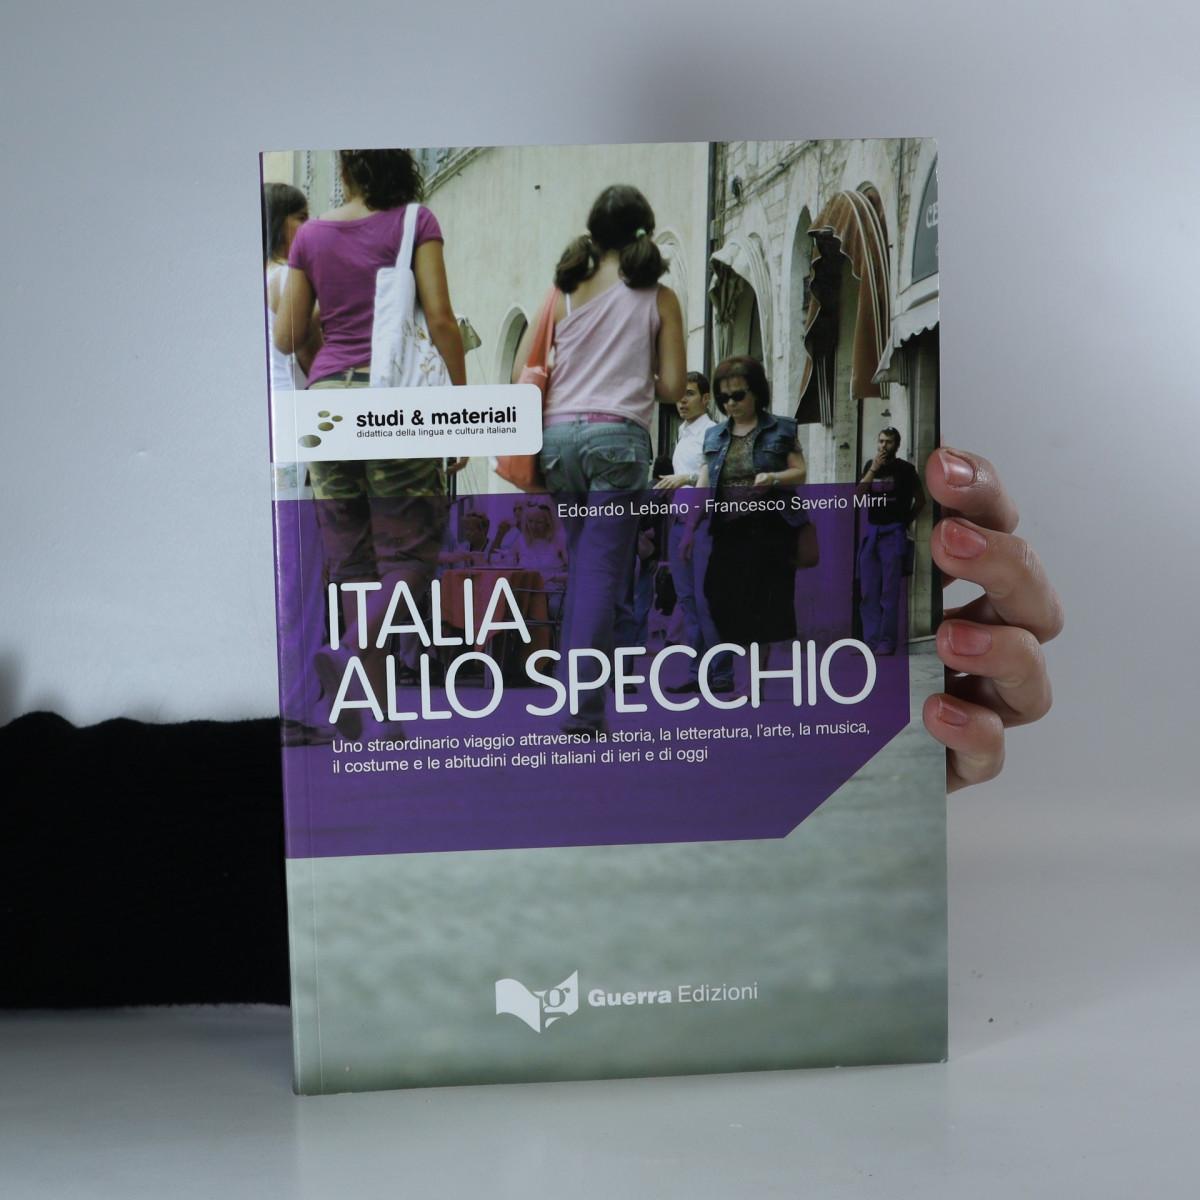 antikvární kniha Italia allo specchio, 2007